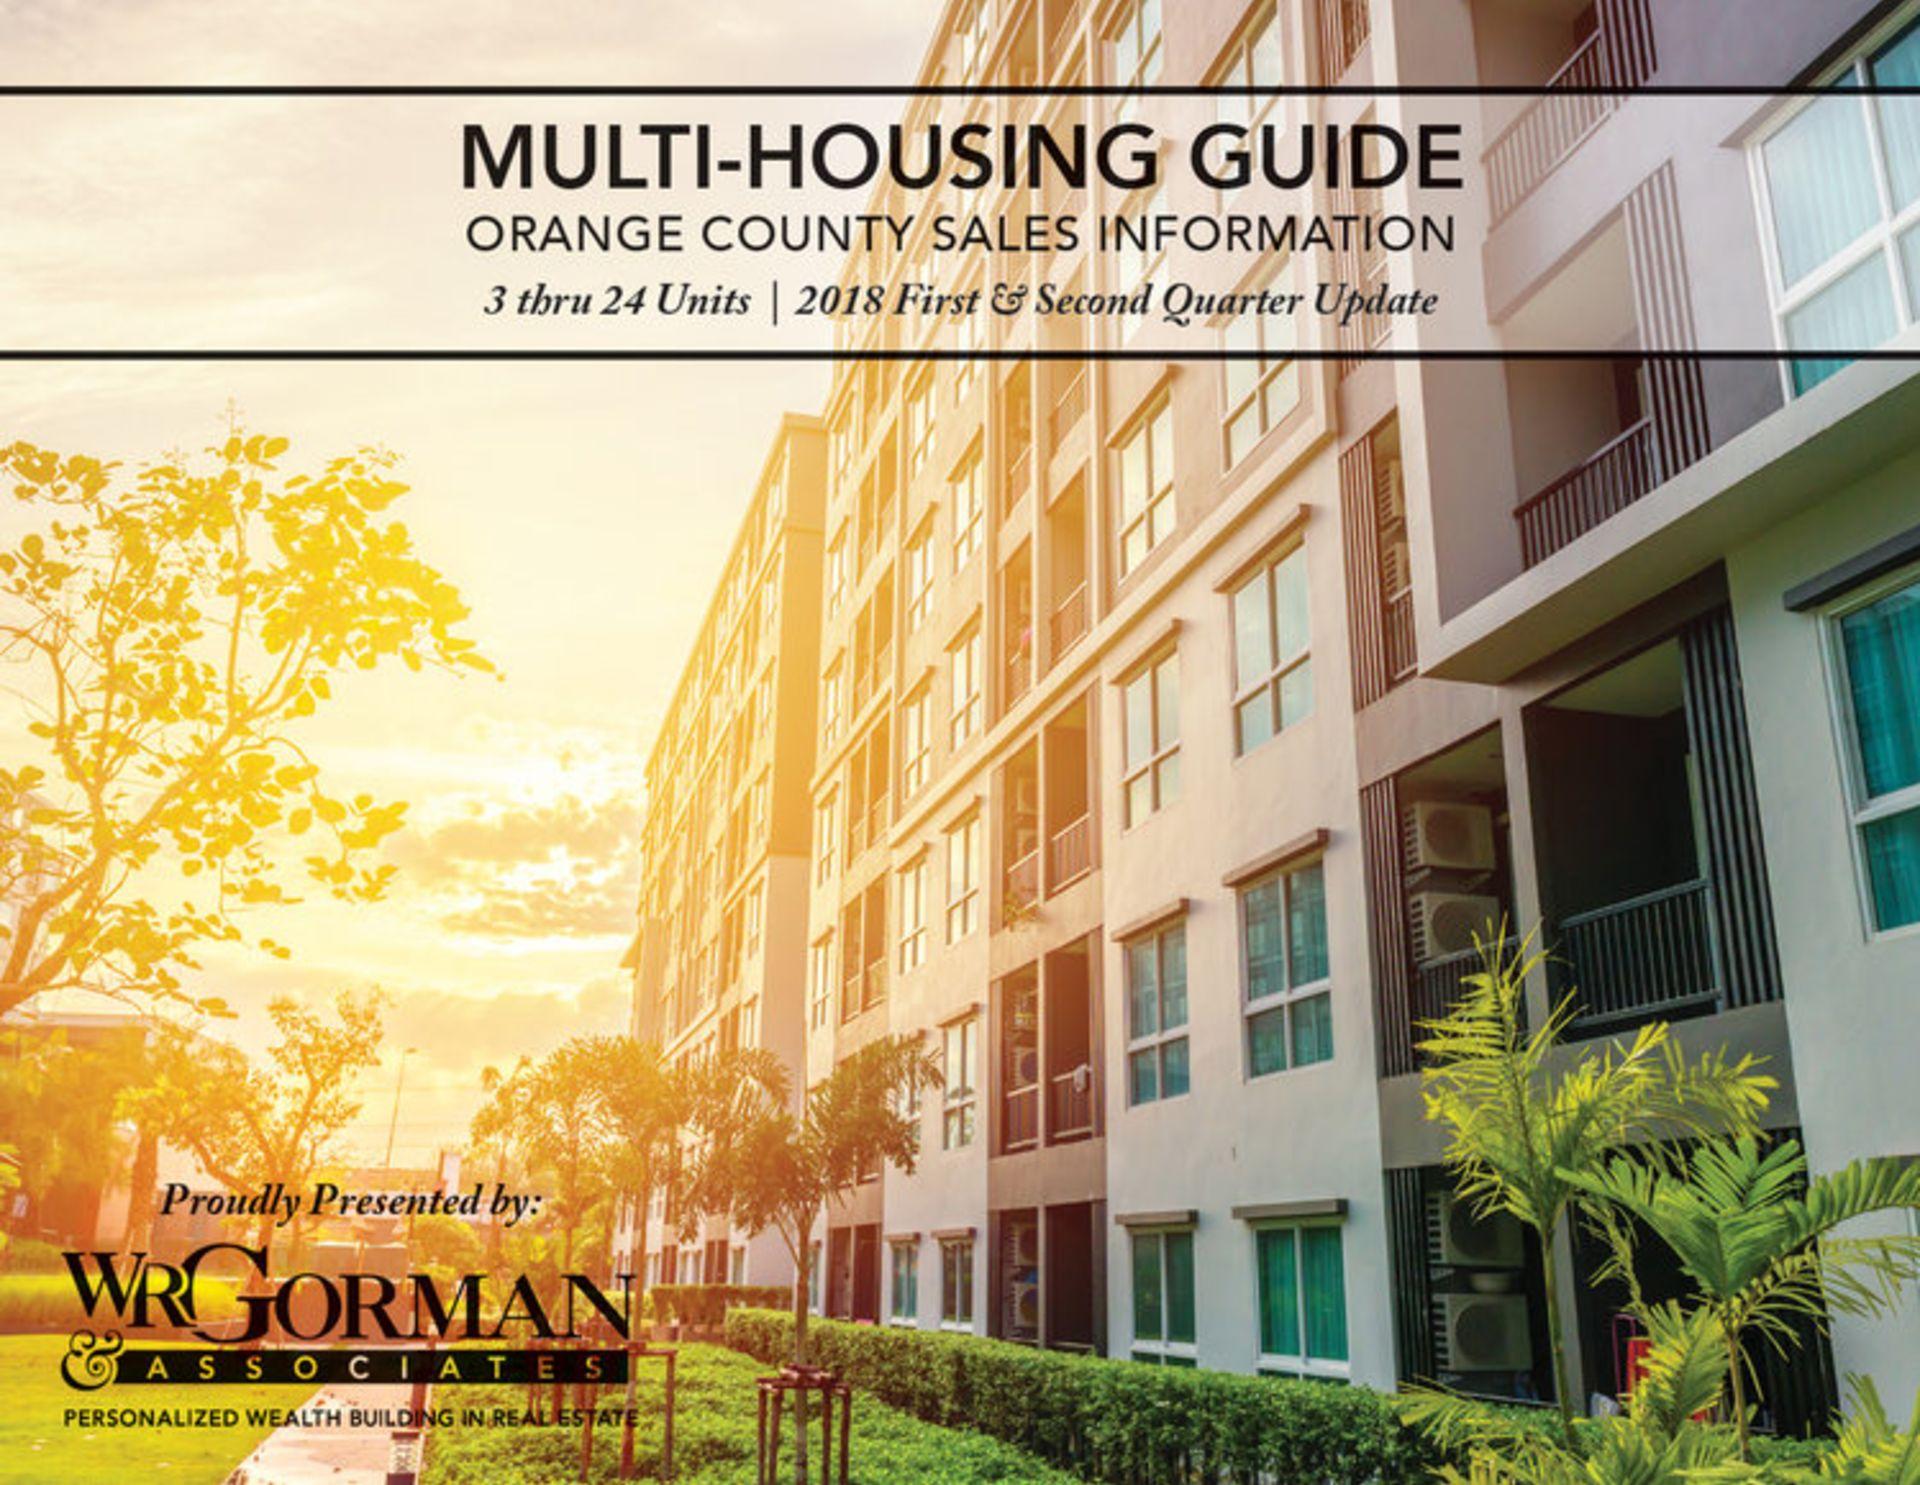 ORANGE COUNTY MULTI-HOUSING GUIDE